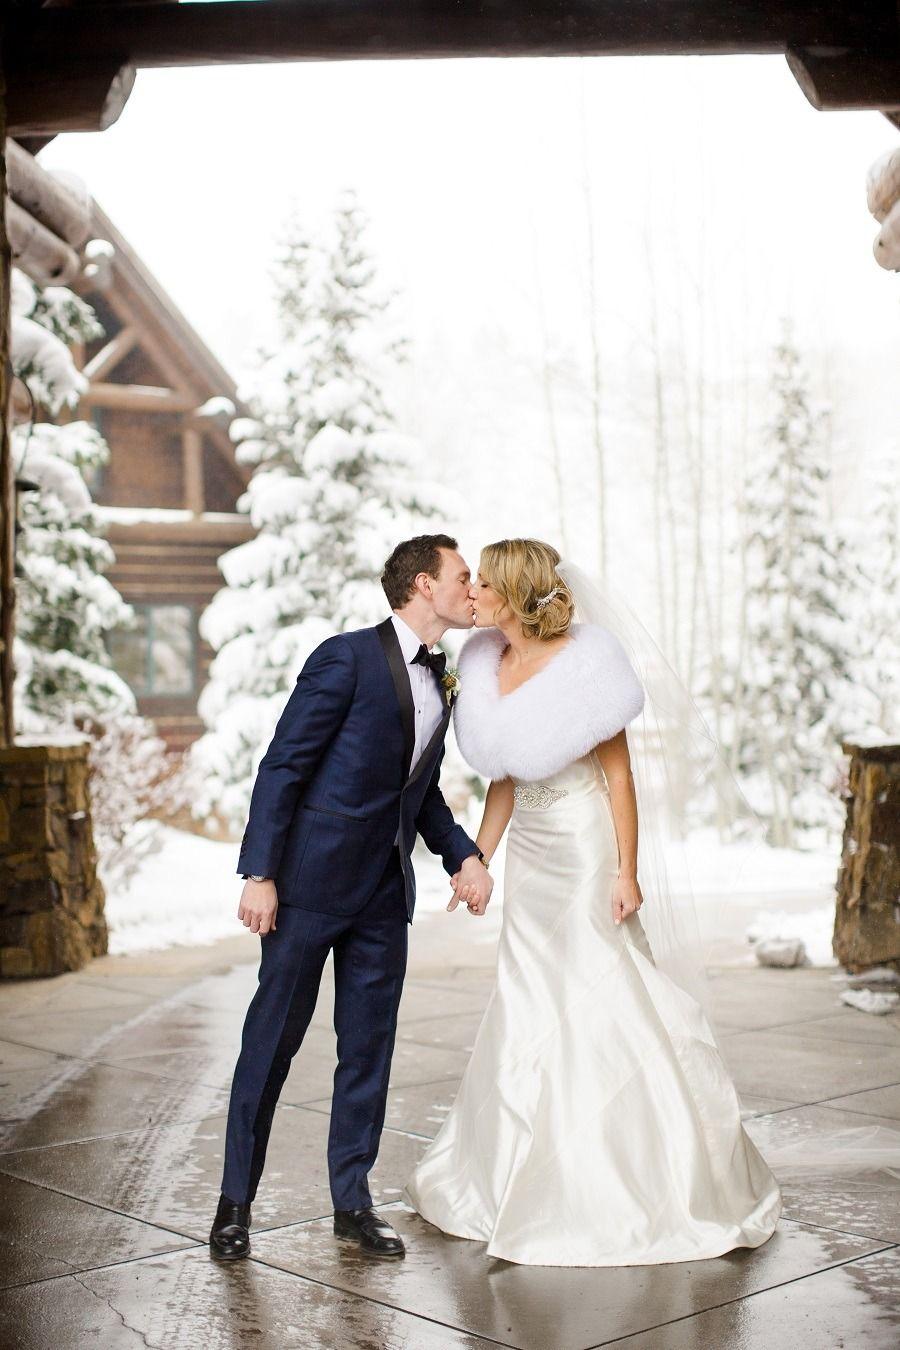 Winter Wedding Attire Navy Tuxedo For The Groom White Fur Stole Bride